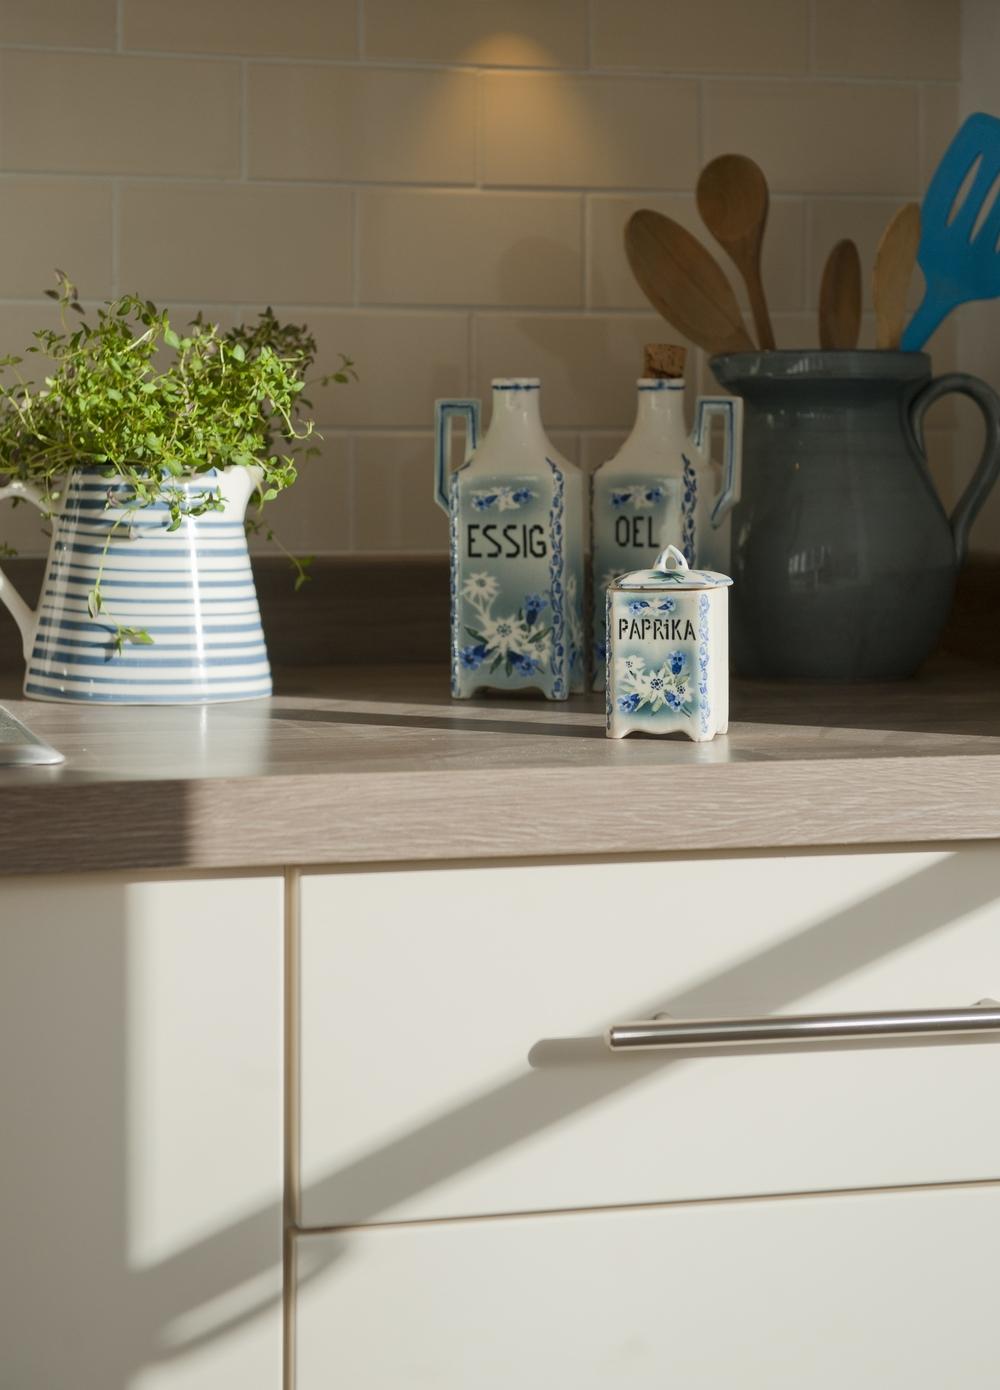 Tunbridge Wells Bungalow Renovation by Smartstyle Interiors Kitchen 16.jpg